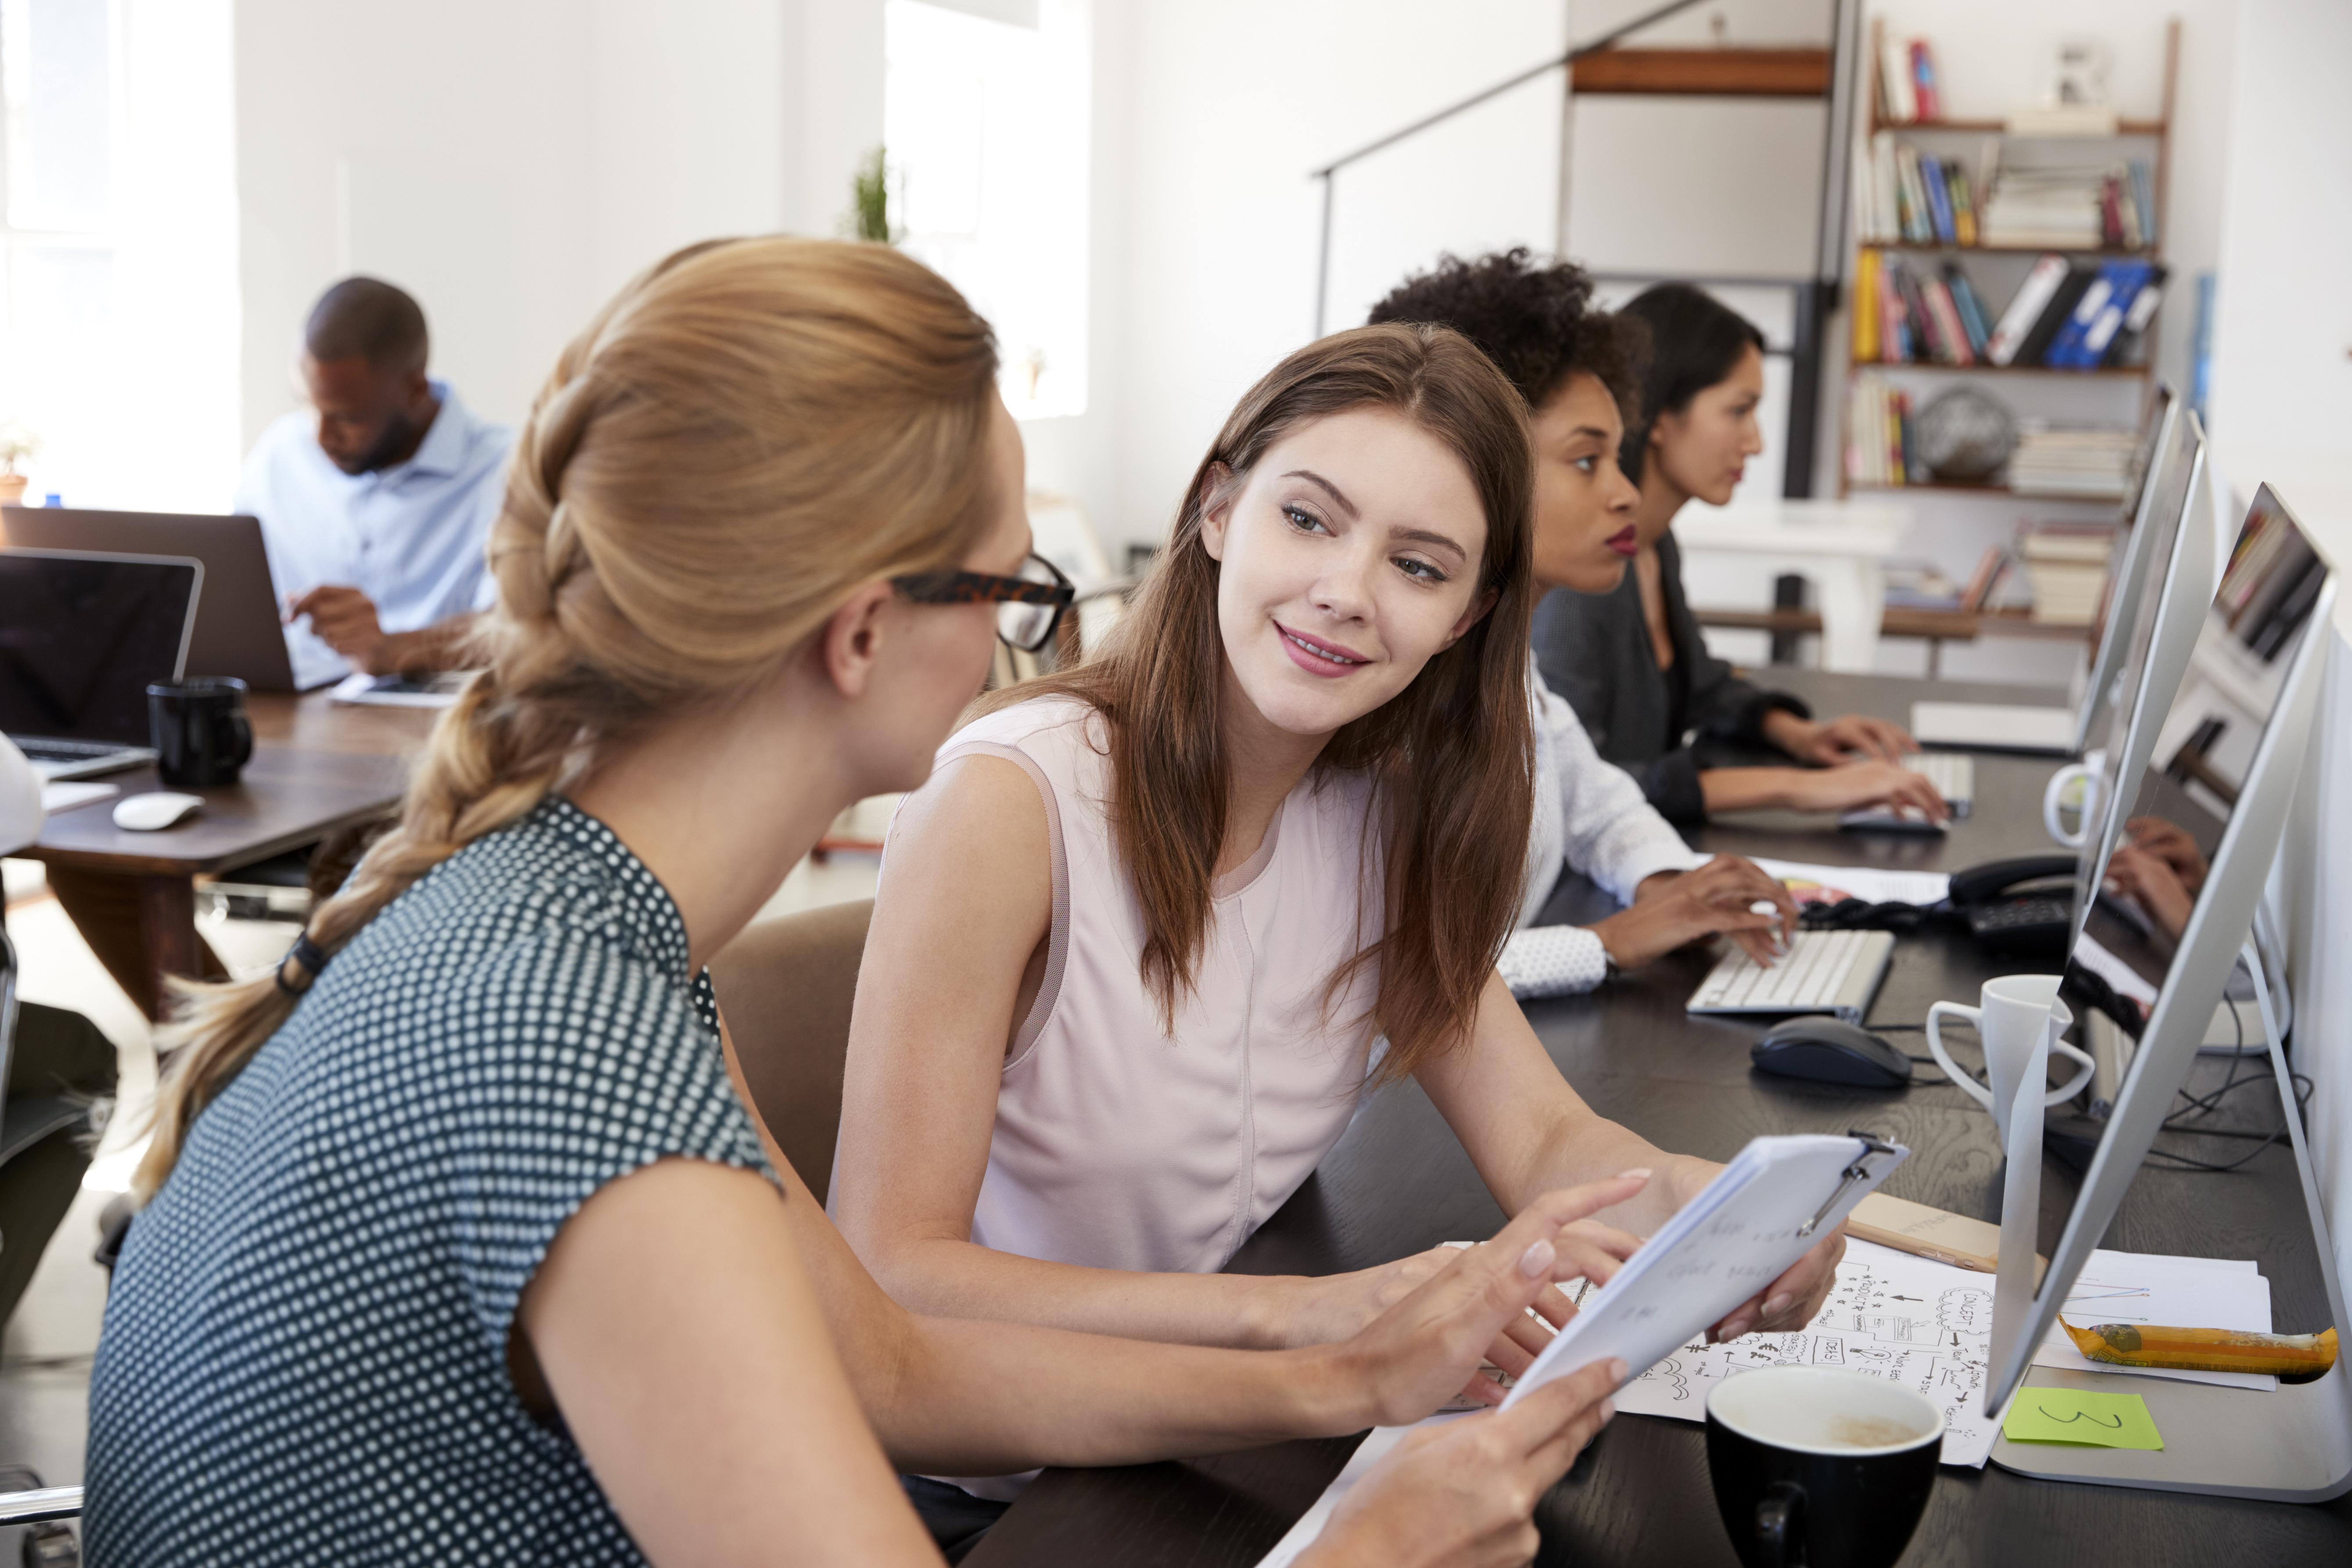 woman-training-new-female-employee-in-an-open-plan-PAJTWLU